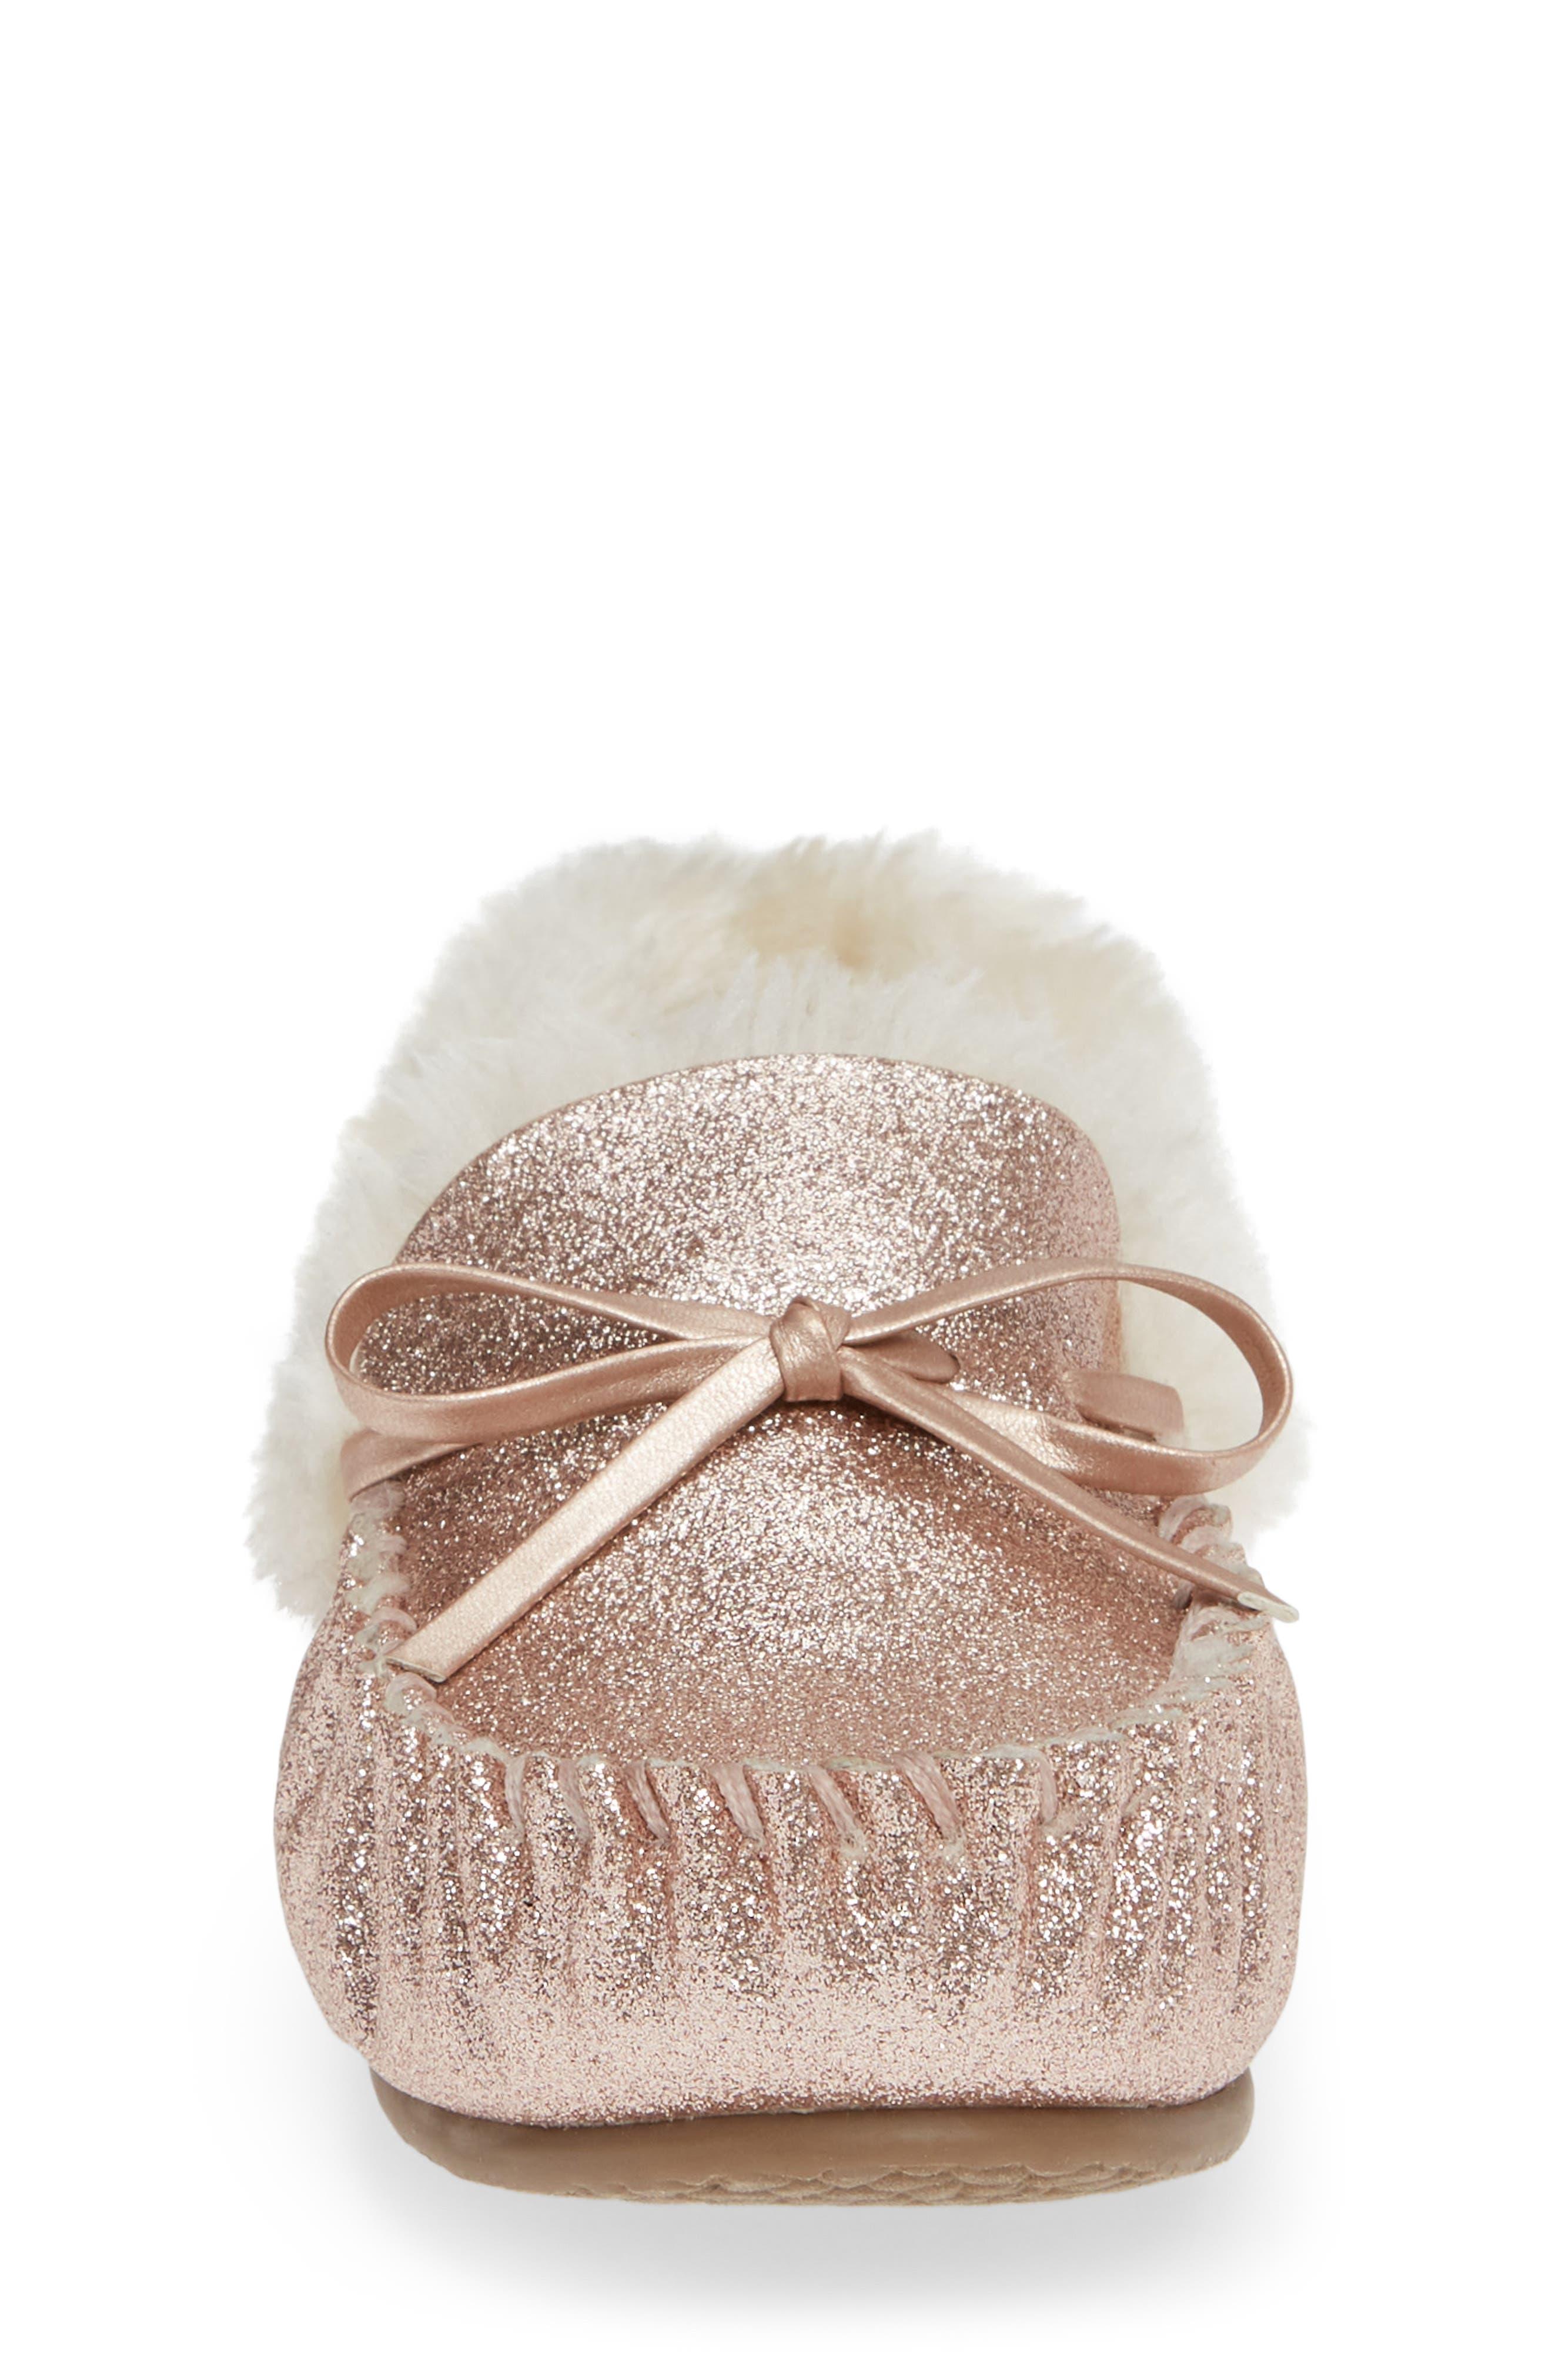 Mila Faux Fur Moccasin Slipper,                             Alternate thumbnail 4, color,                             710